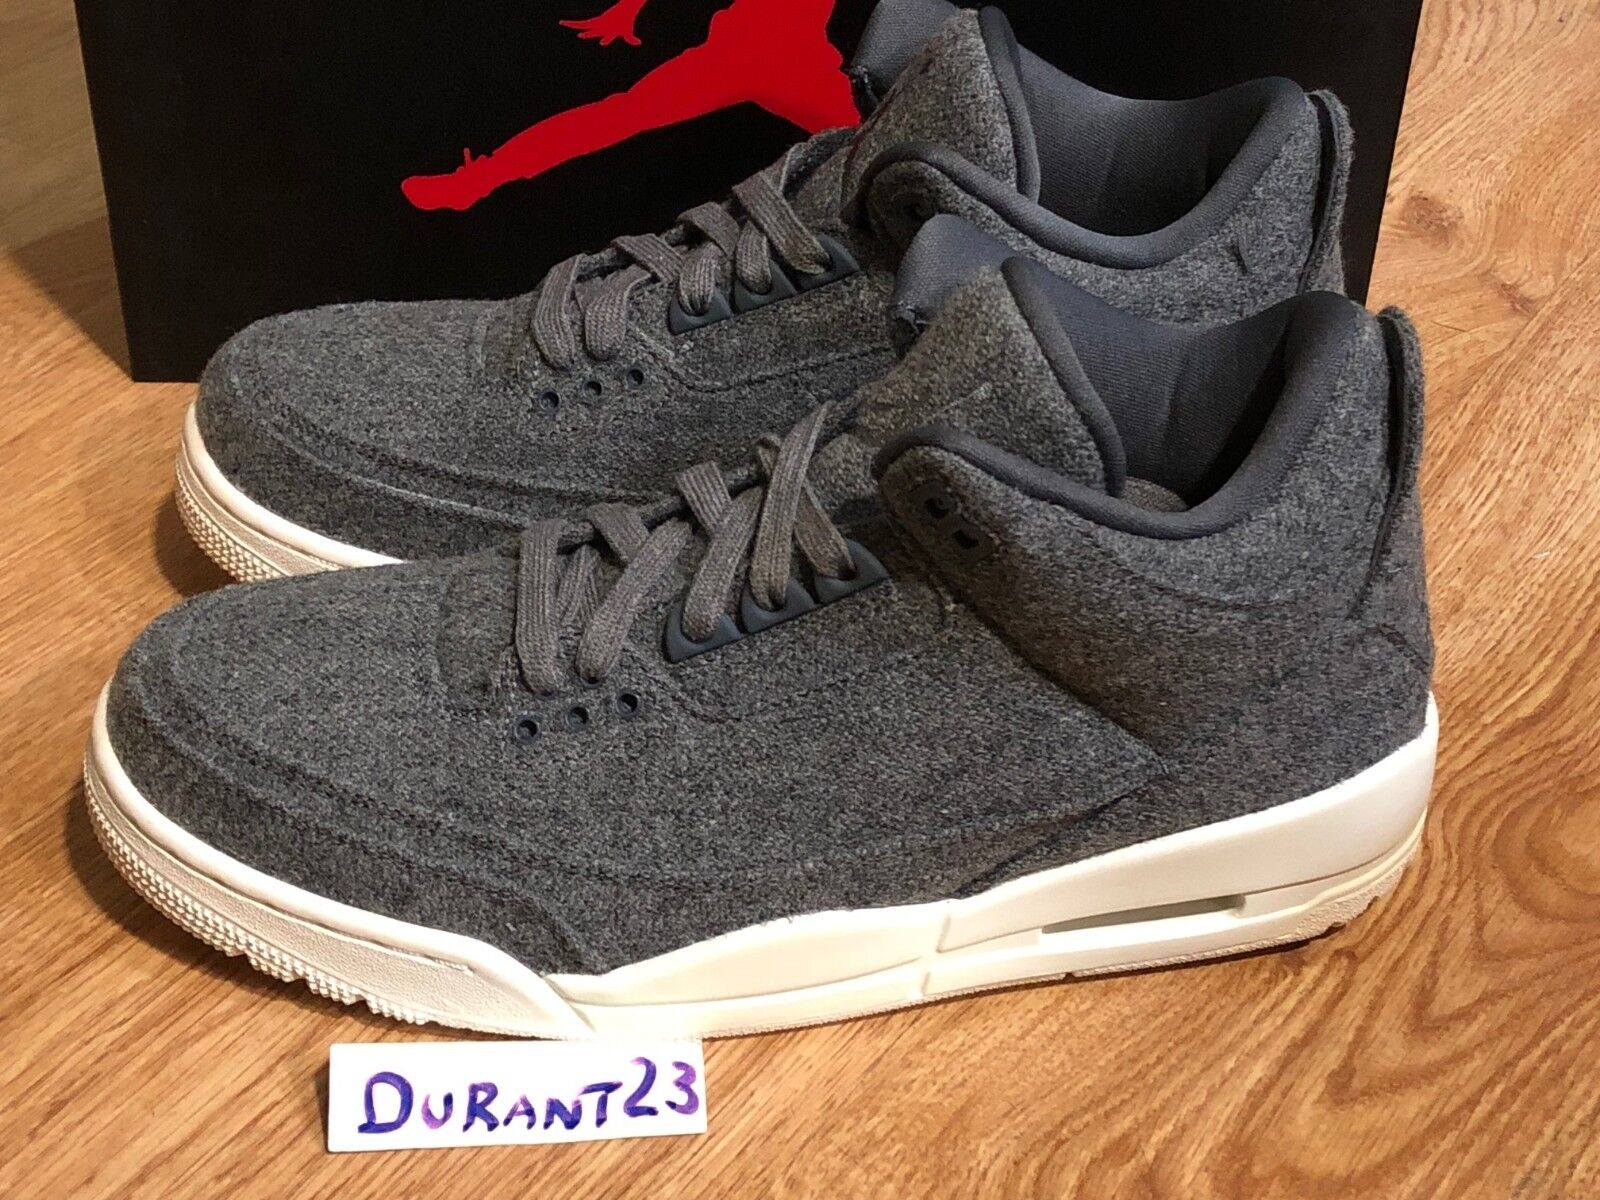 Nike Air Jordan 3 Retro Wool, 854263-004 & 861427-004. Sizes 5Y to 12 USA